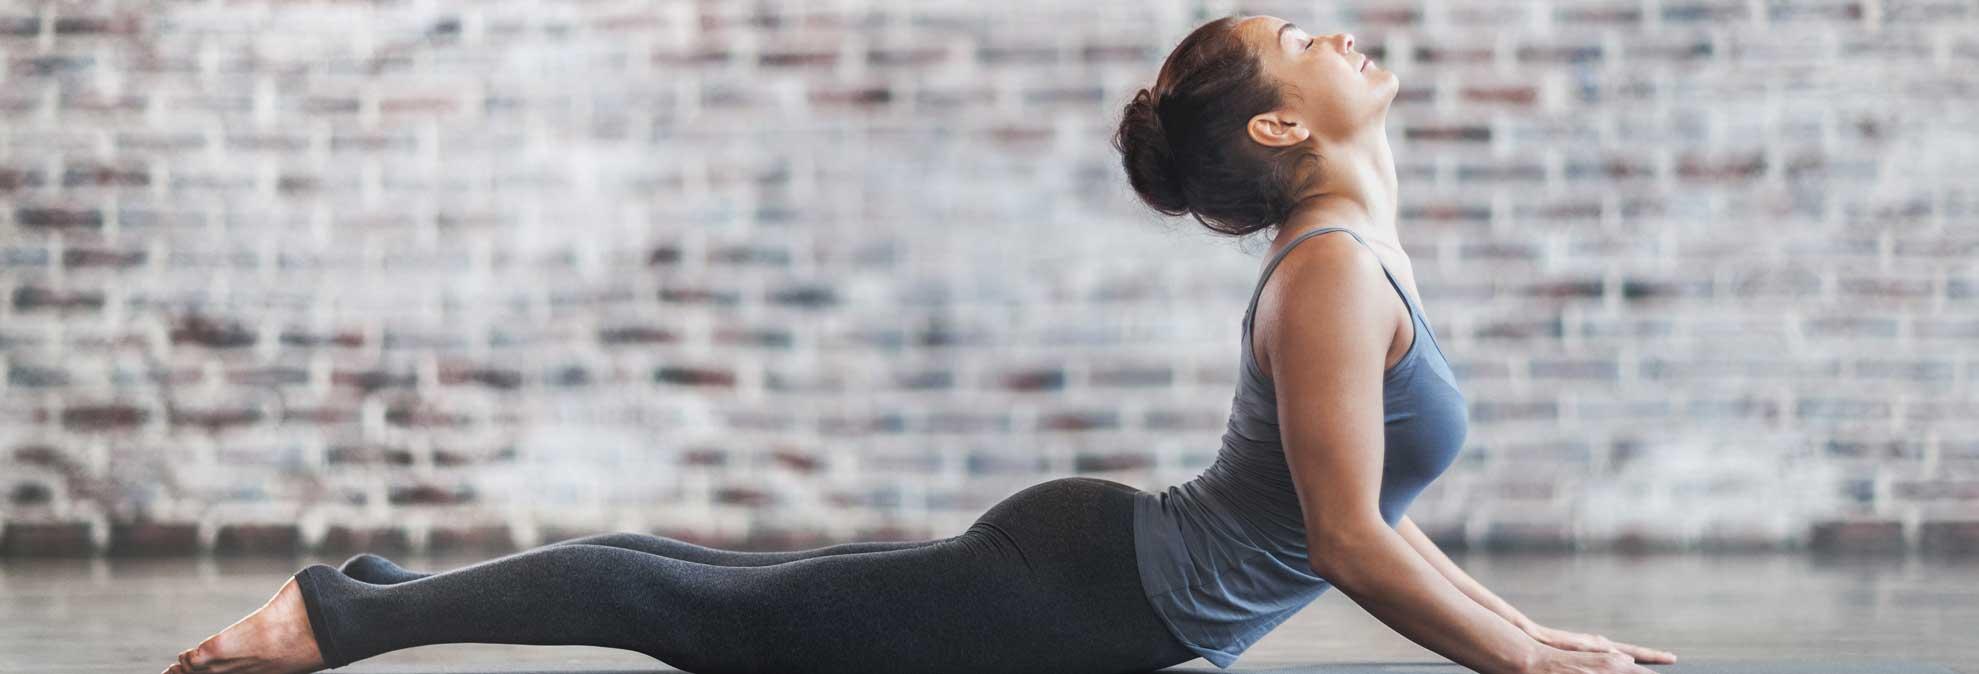 Yoga for back pain singapore